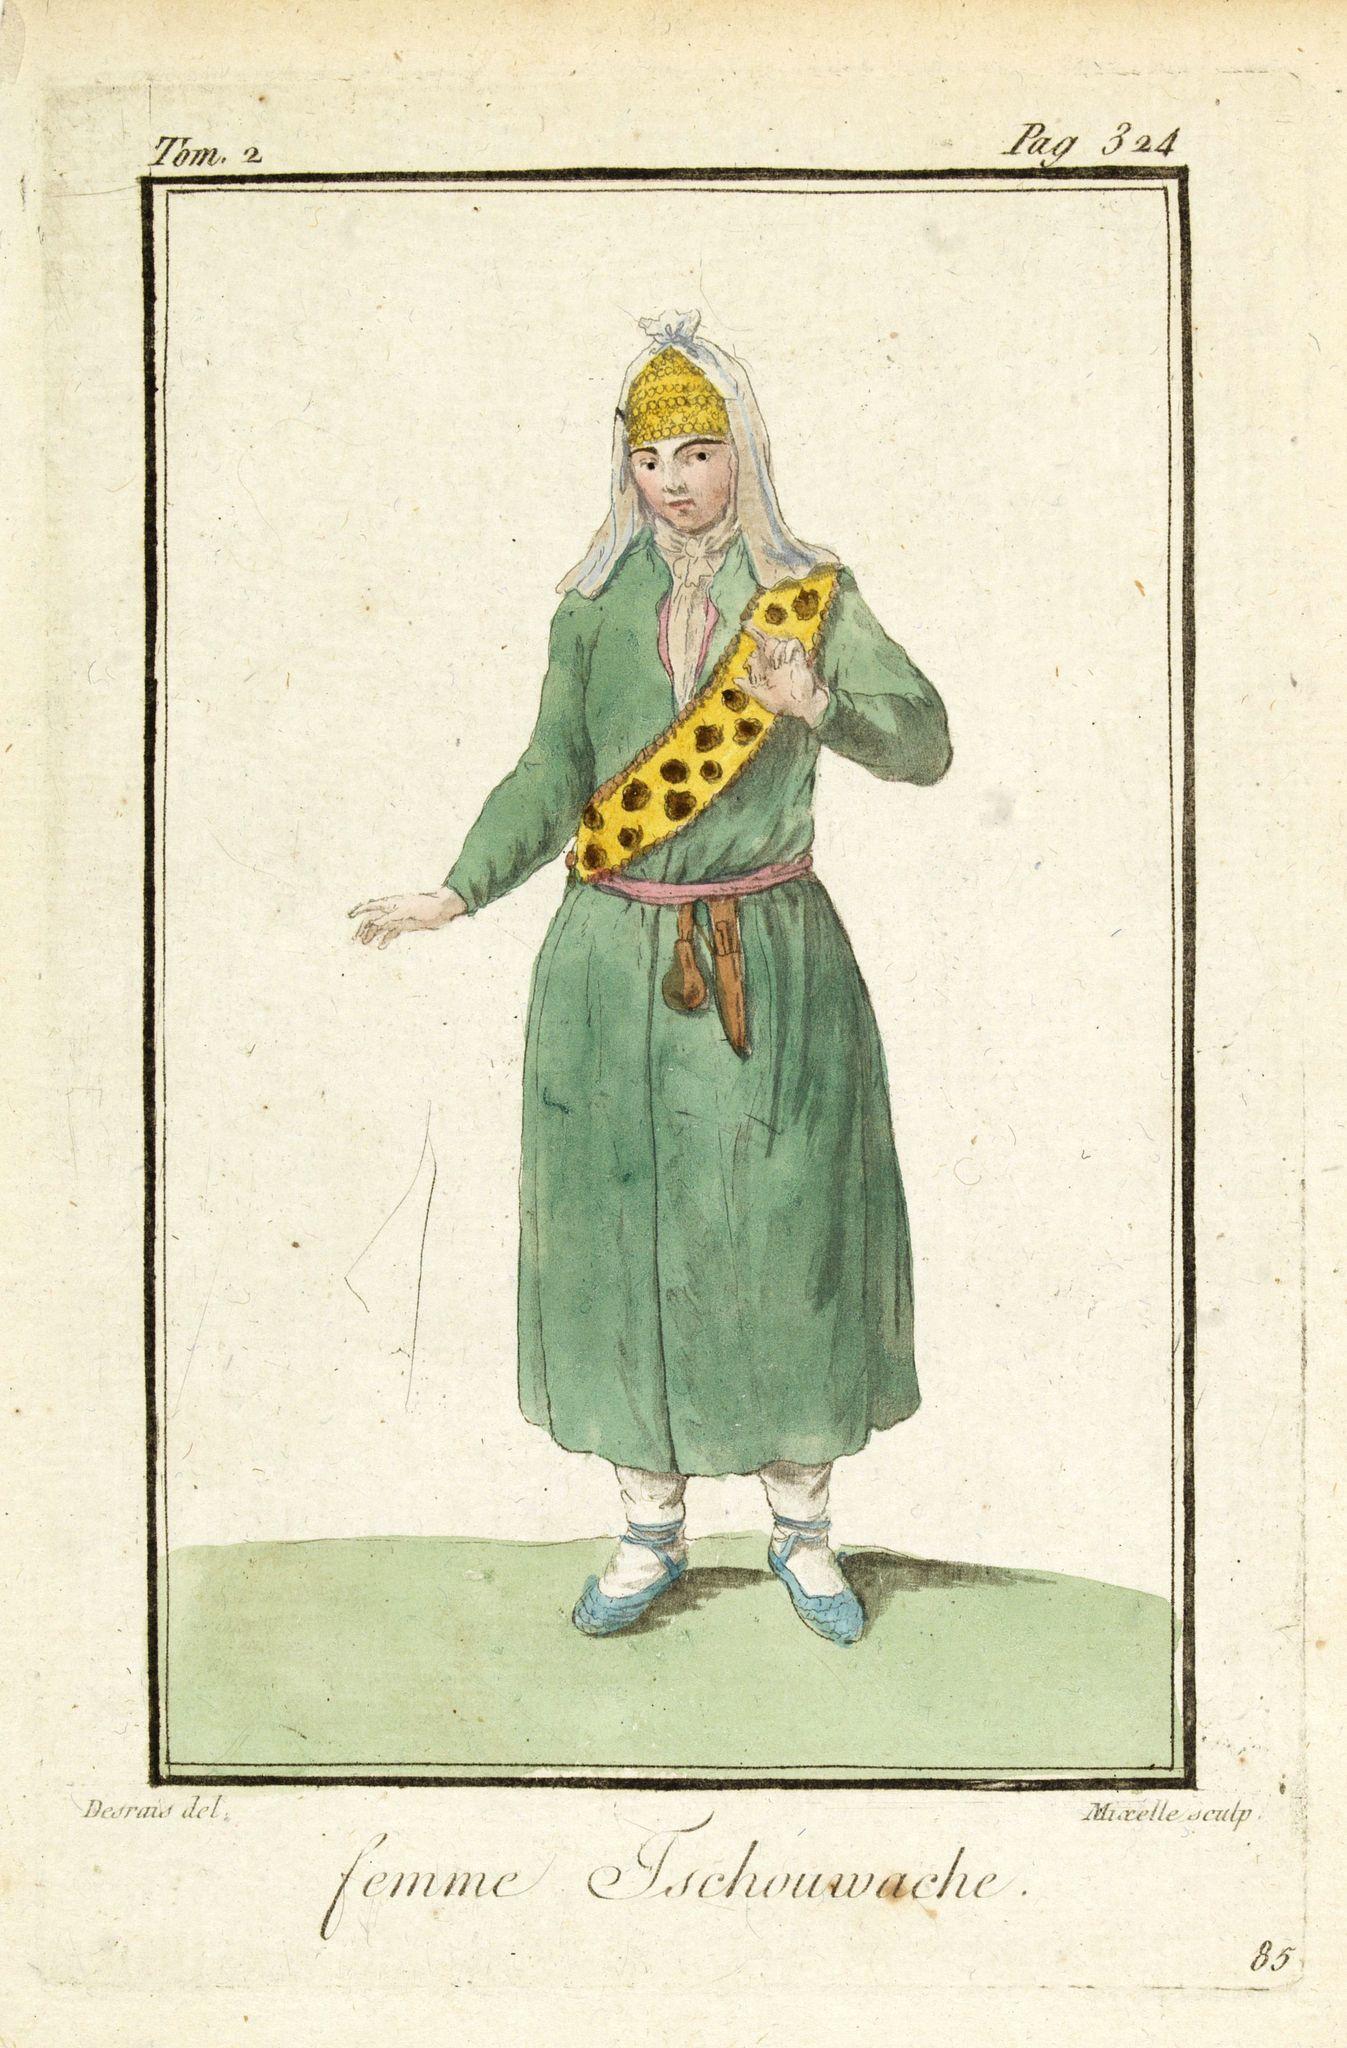 GRASSET DE SAINT SAUVEUR, J. -  Femme Tschouwache.